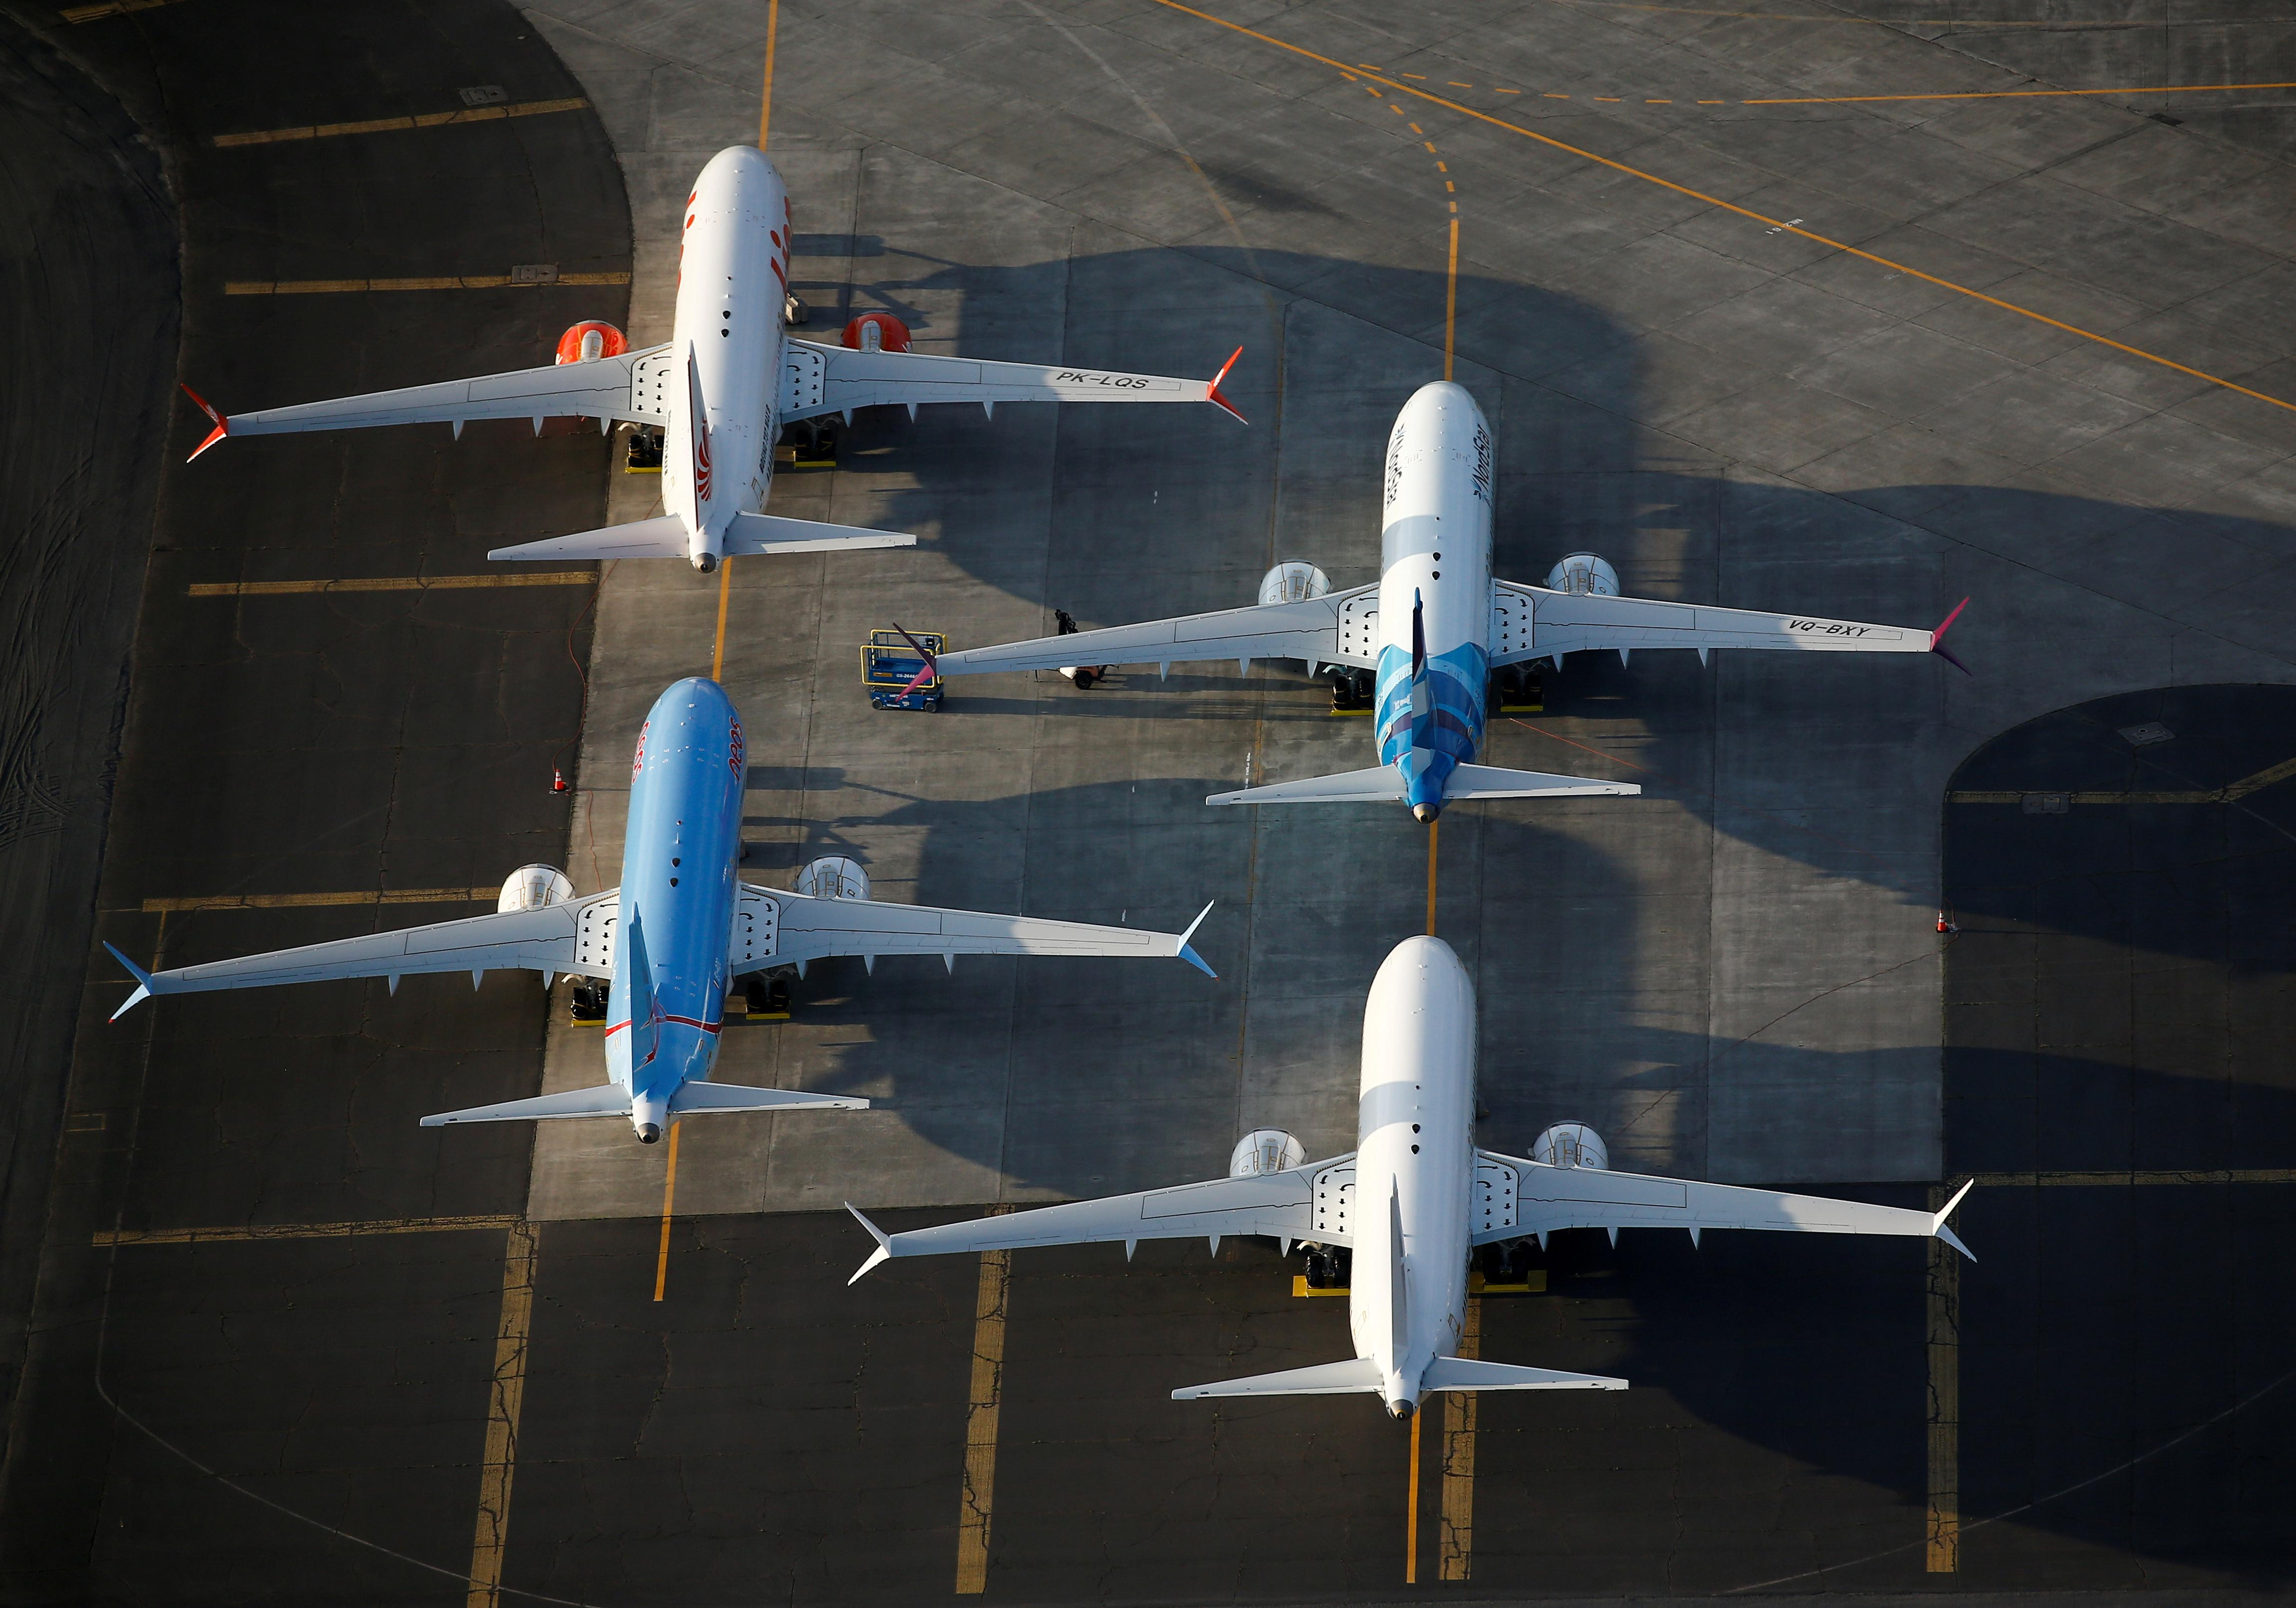 Boeing gets first 737 MAX order in months; deliveries halve